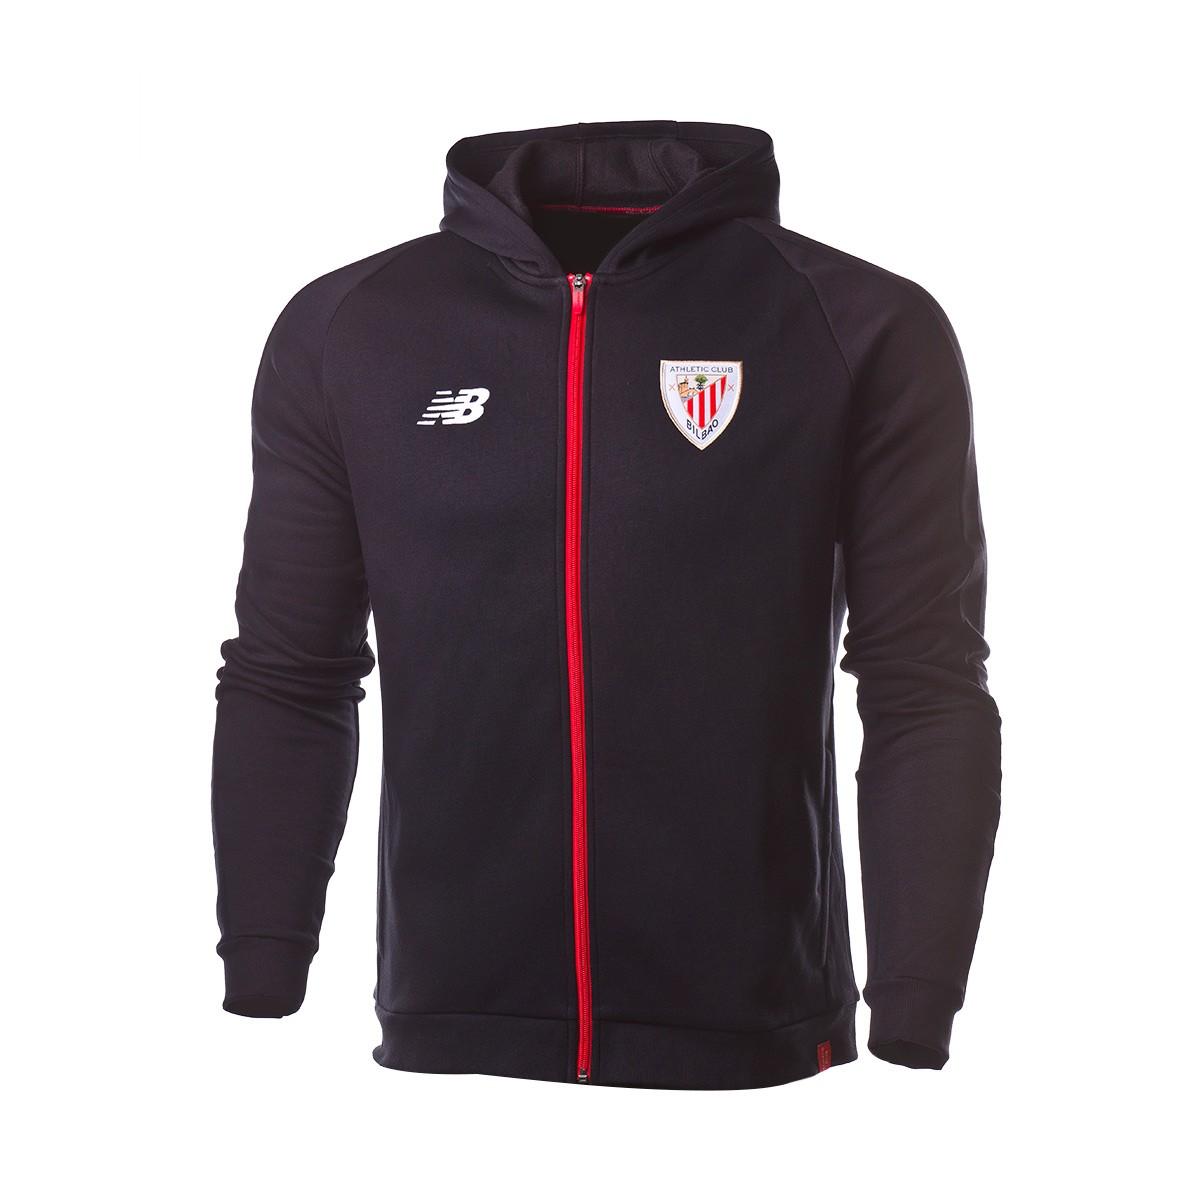 09a45acb24764 Chamarra New Balance con Capucha AC Bilbao 2018-2019 Black - Tienda de  fútbol Fútbol Emotion